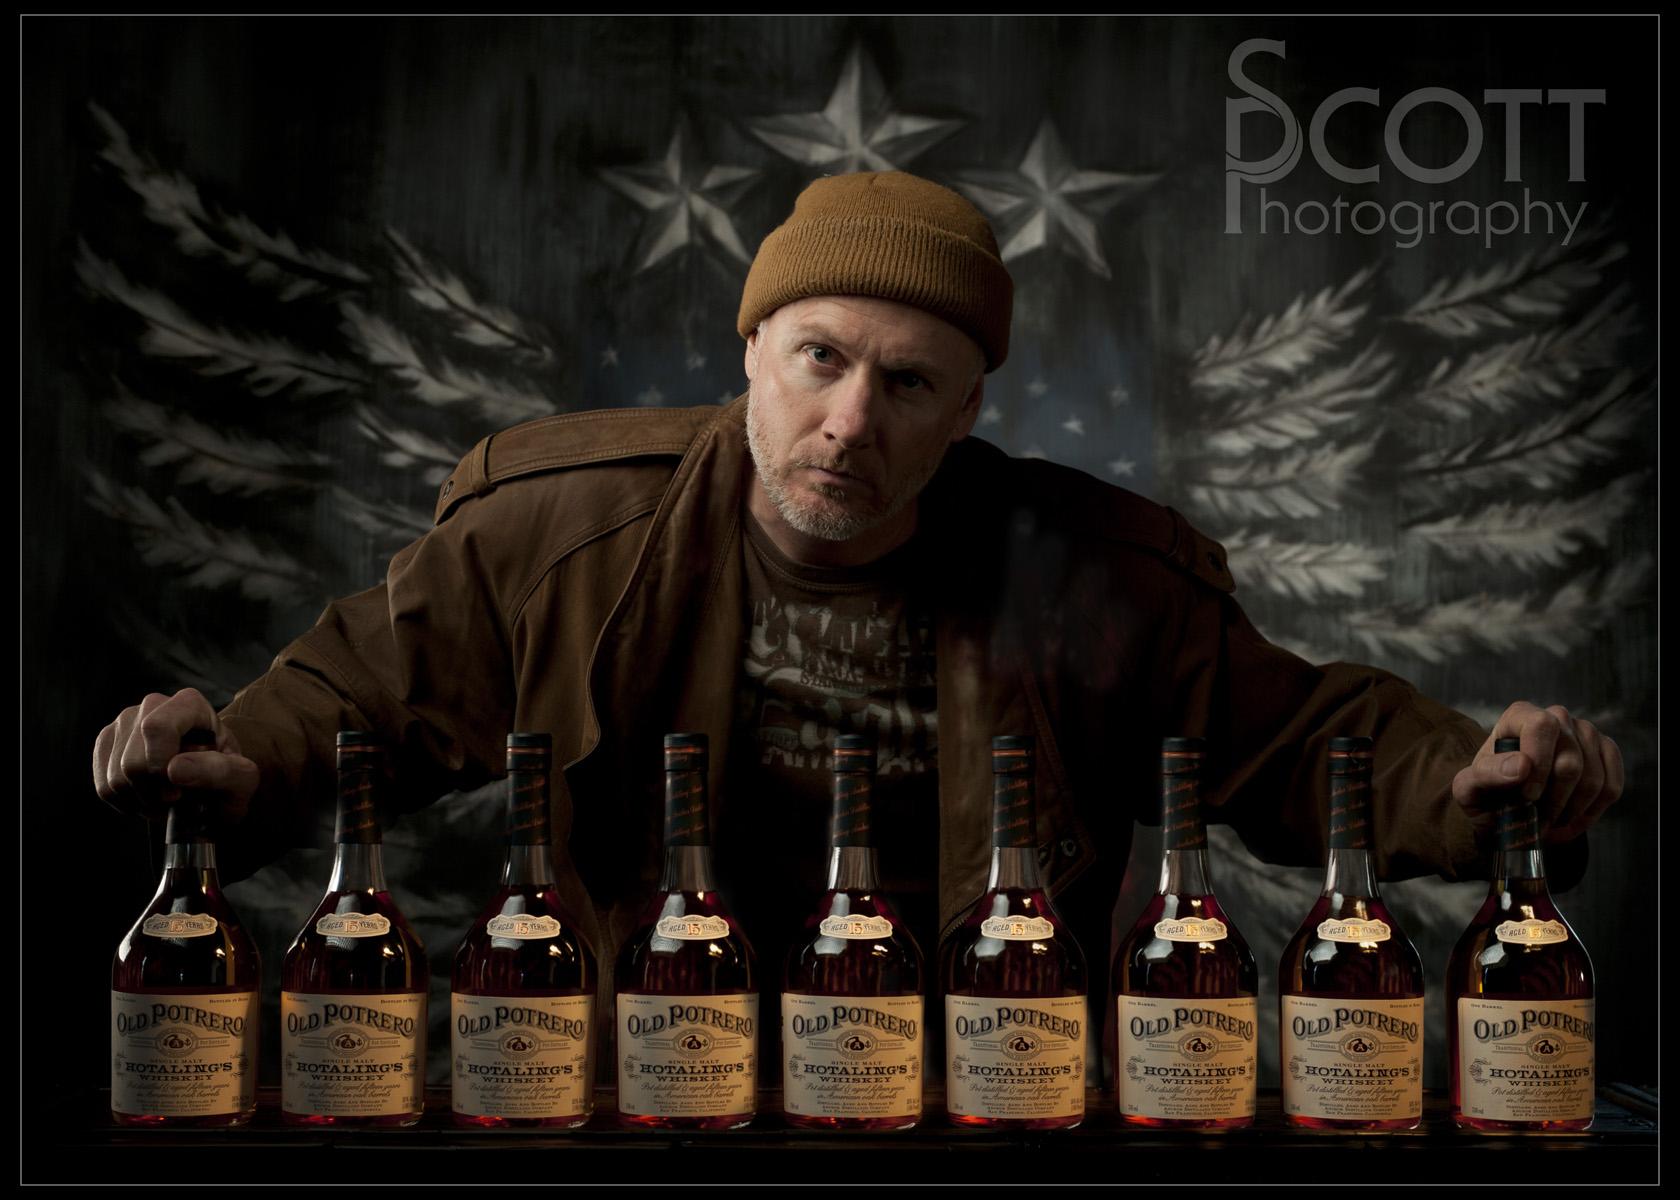 masterphotog's photos in Bourbon.